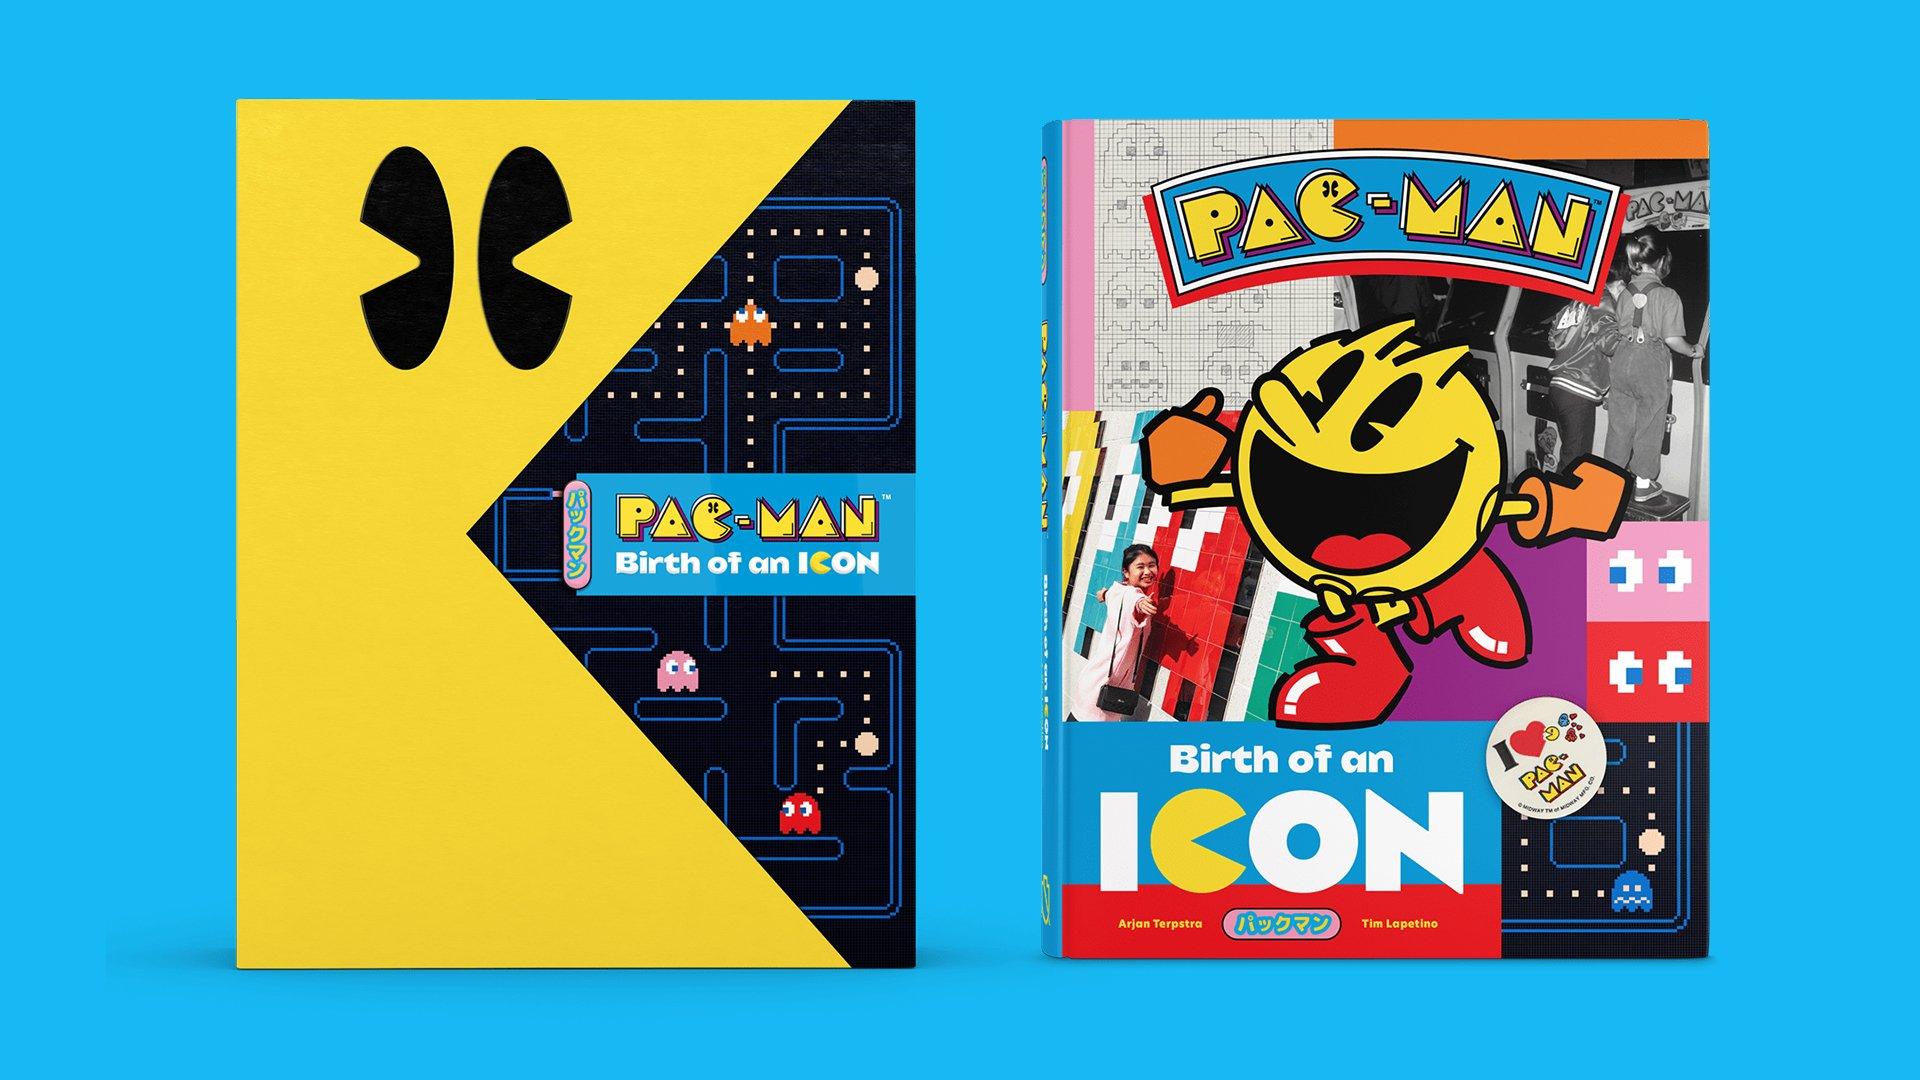 Pac-Man: Birth of an Icon Bandai Namco Cook & Becker Review